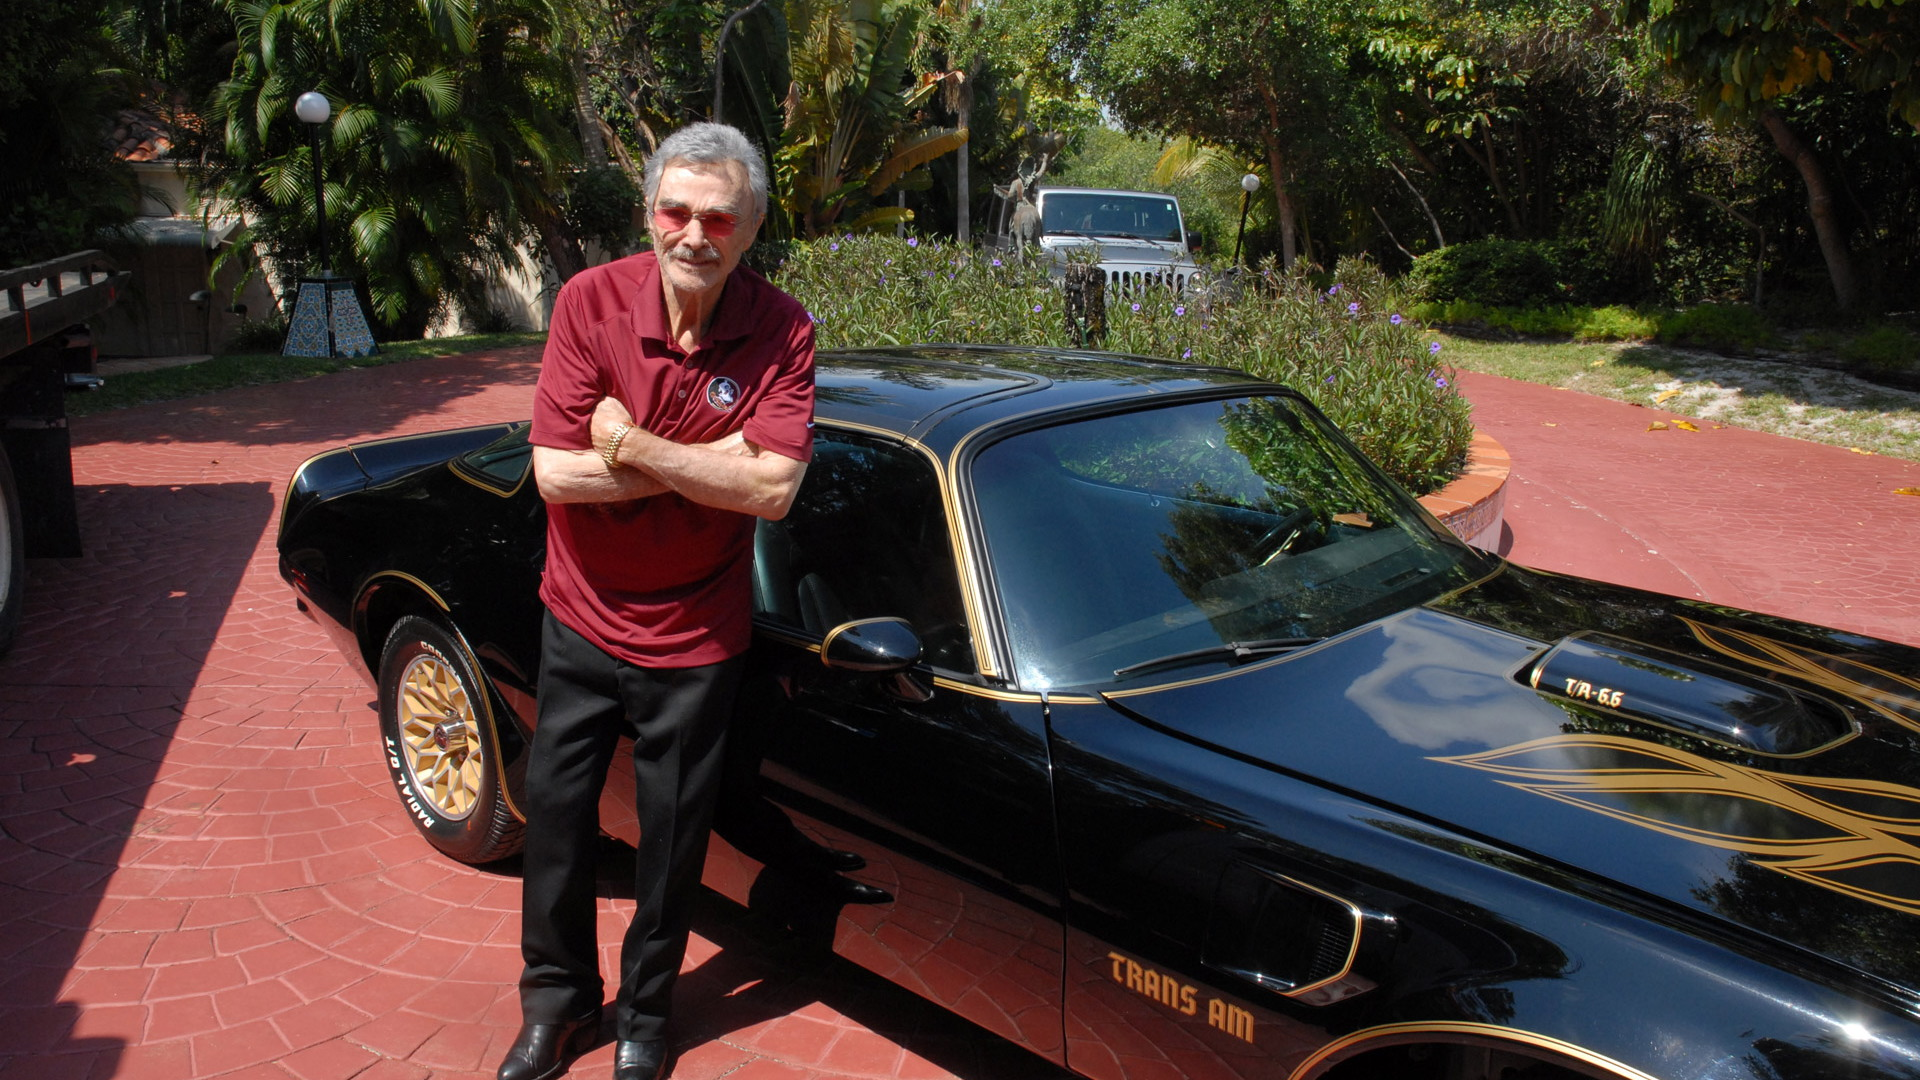 Burt Reynolds' second Bandit Pontiac Trans Am sells for $170,000